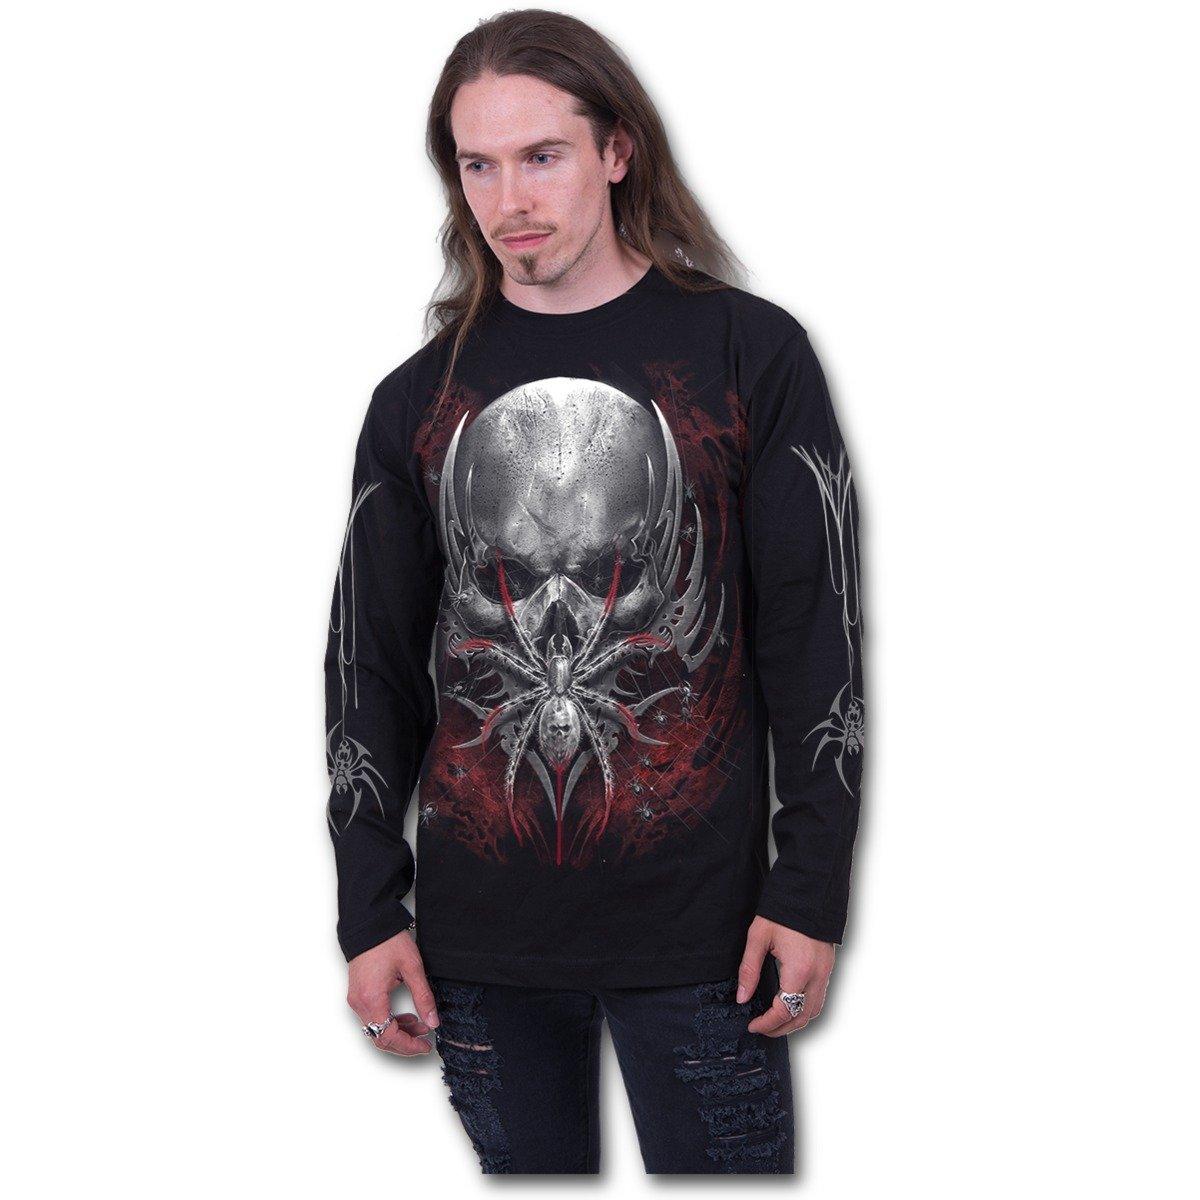 Spiral Spider Skull - Longsleeve T-Shirt Black Spiral Direct Ltd D073M301